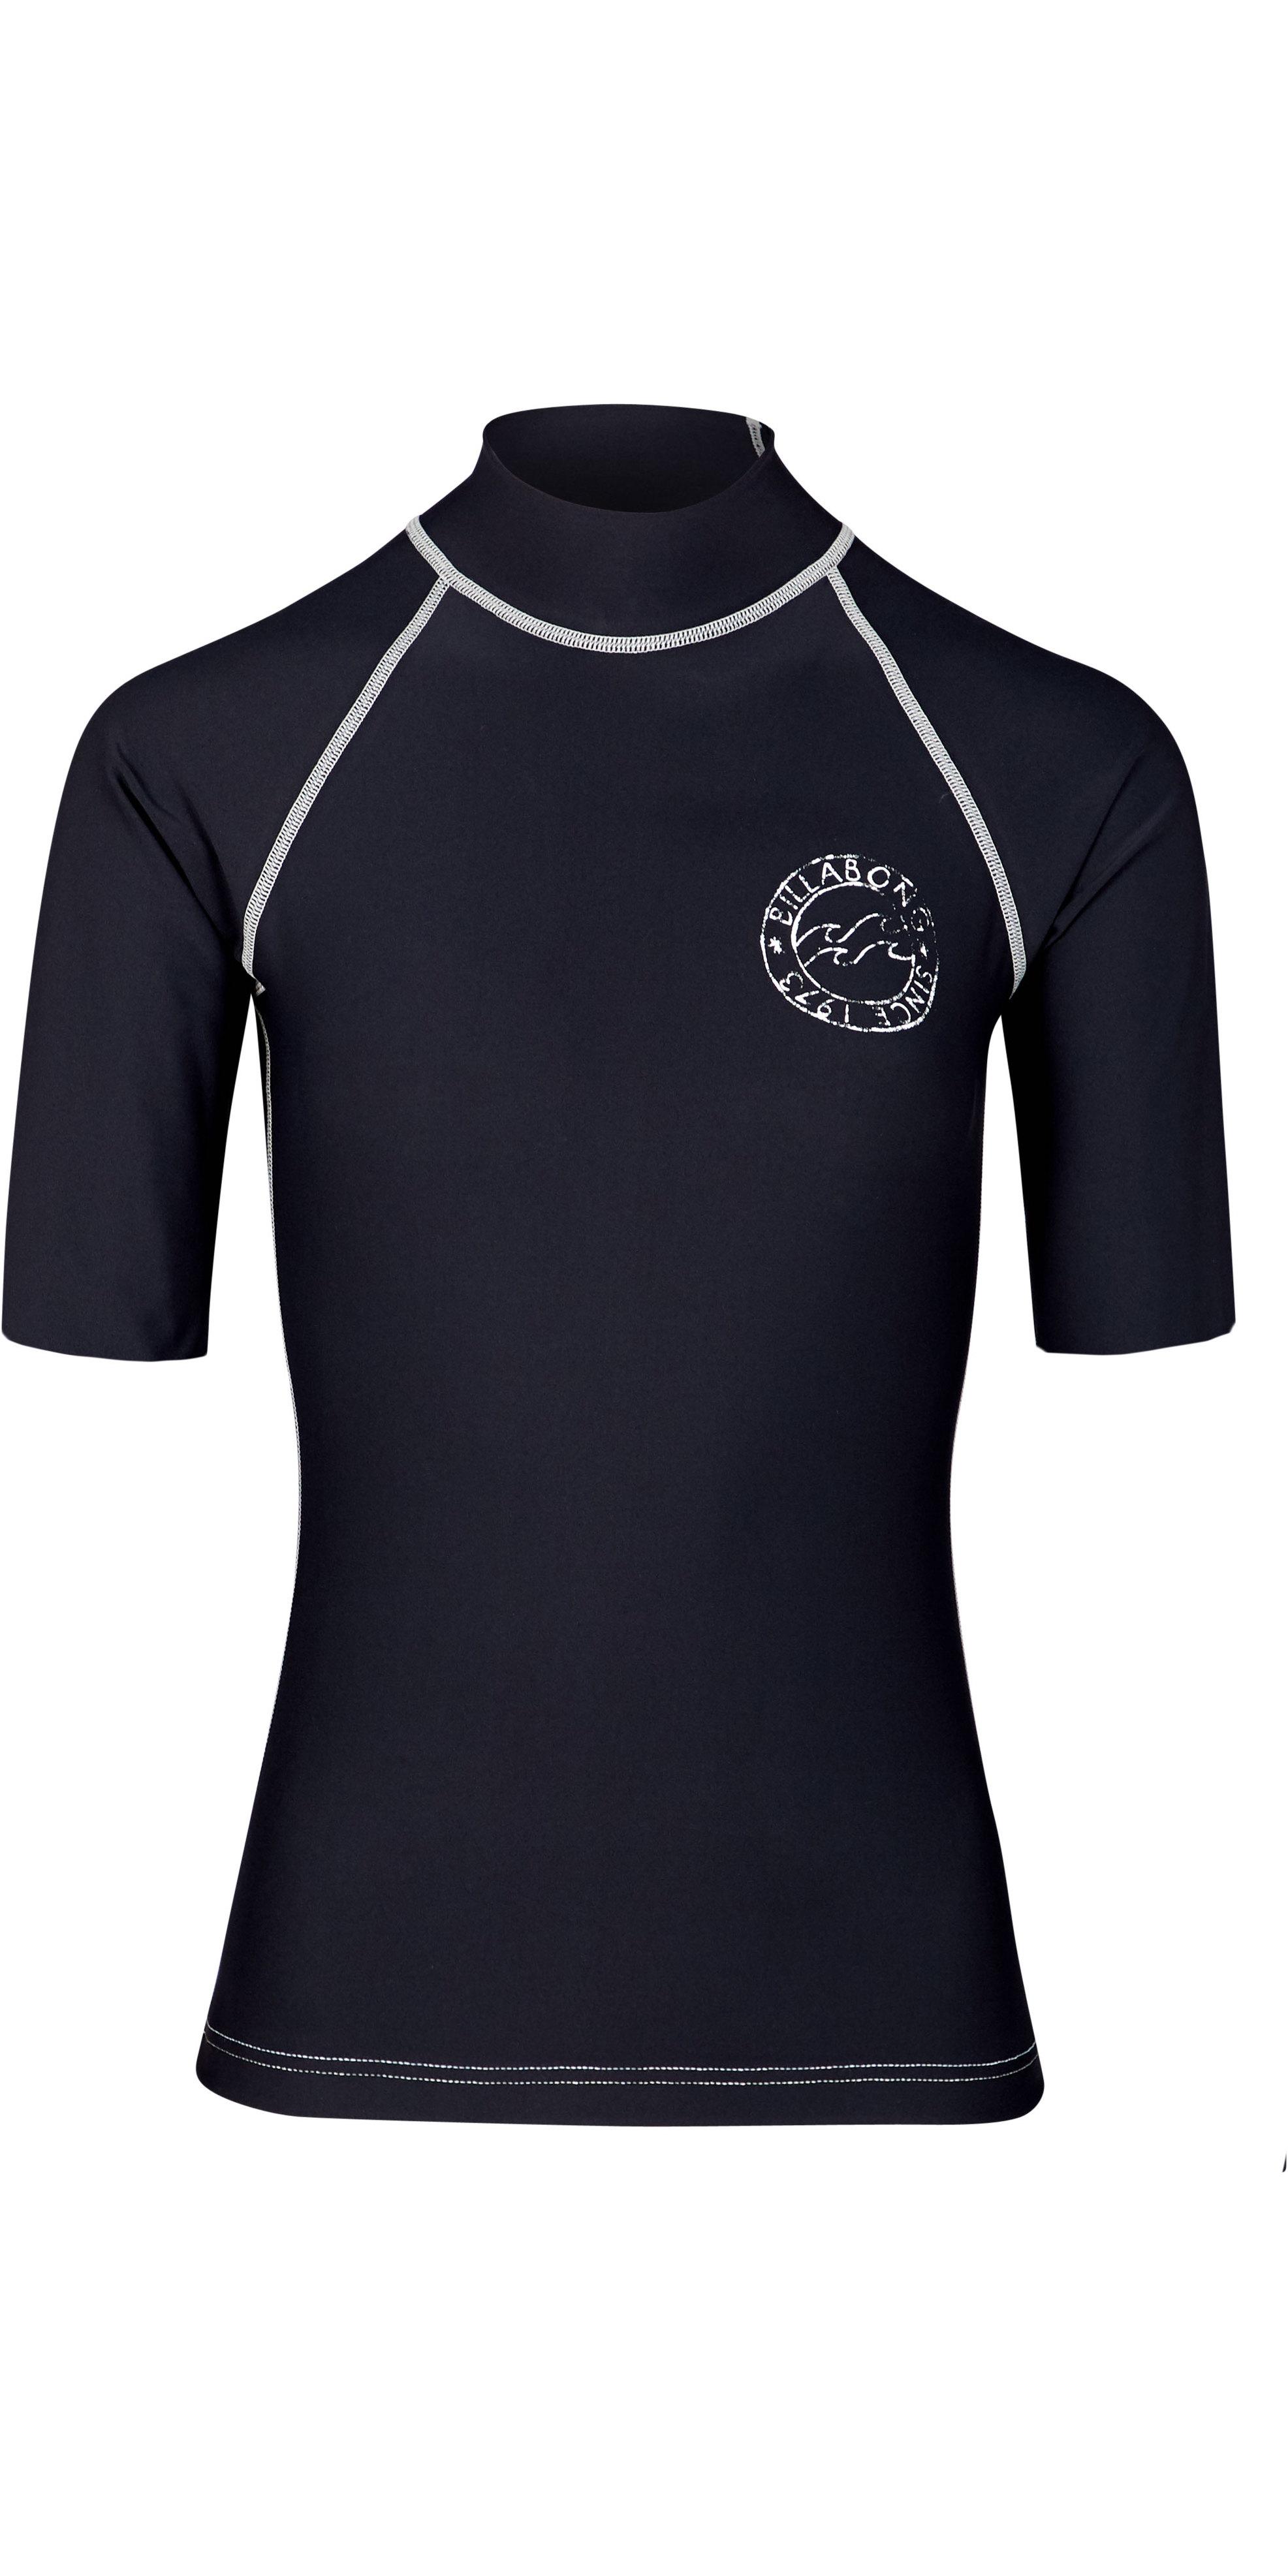 2019 Billabong Womens Logo In Short Sleeve Rash Vest Black Pebble N4GY01